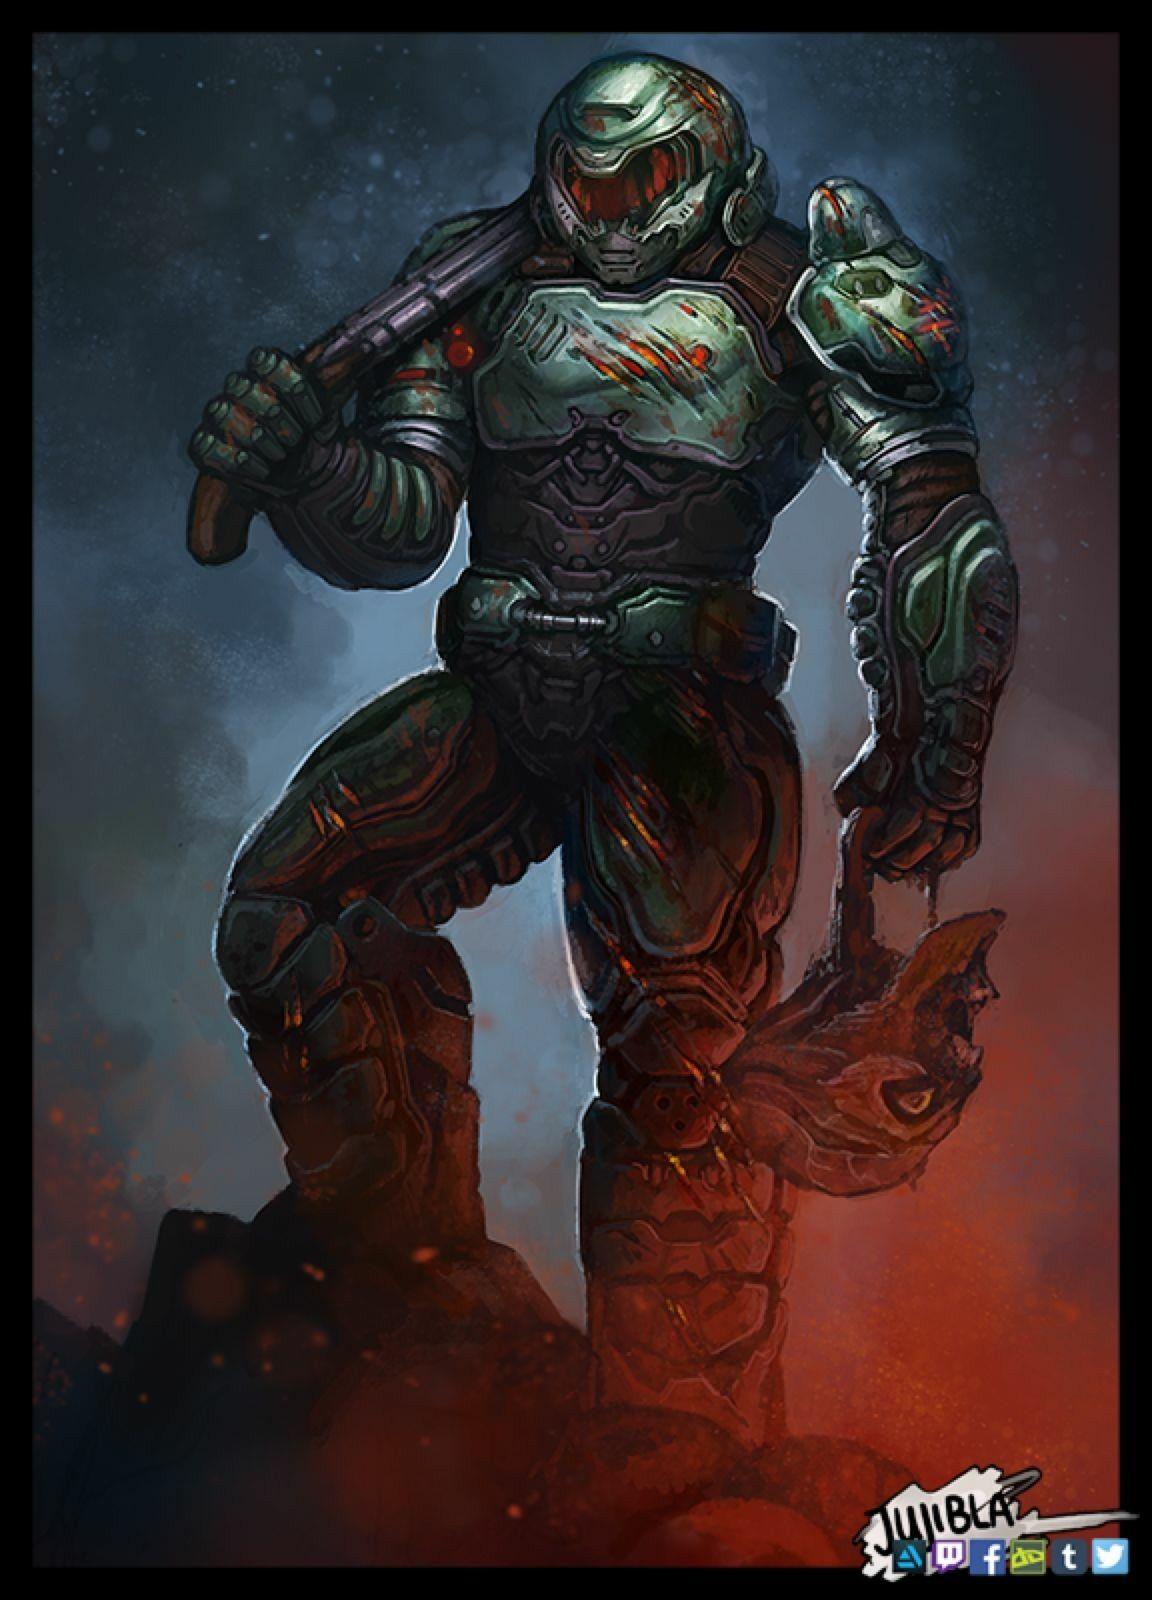 Pin by Preston Bickle on DOOM Doom, Doom videogame, Doom